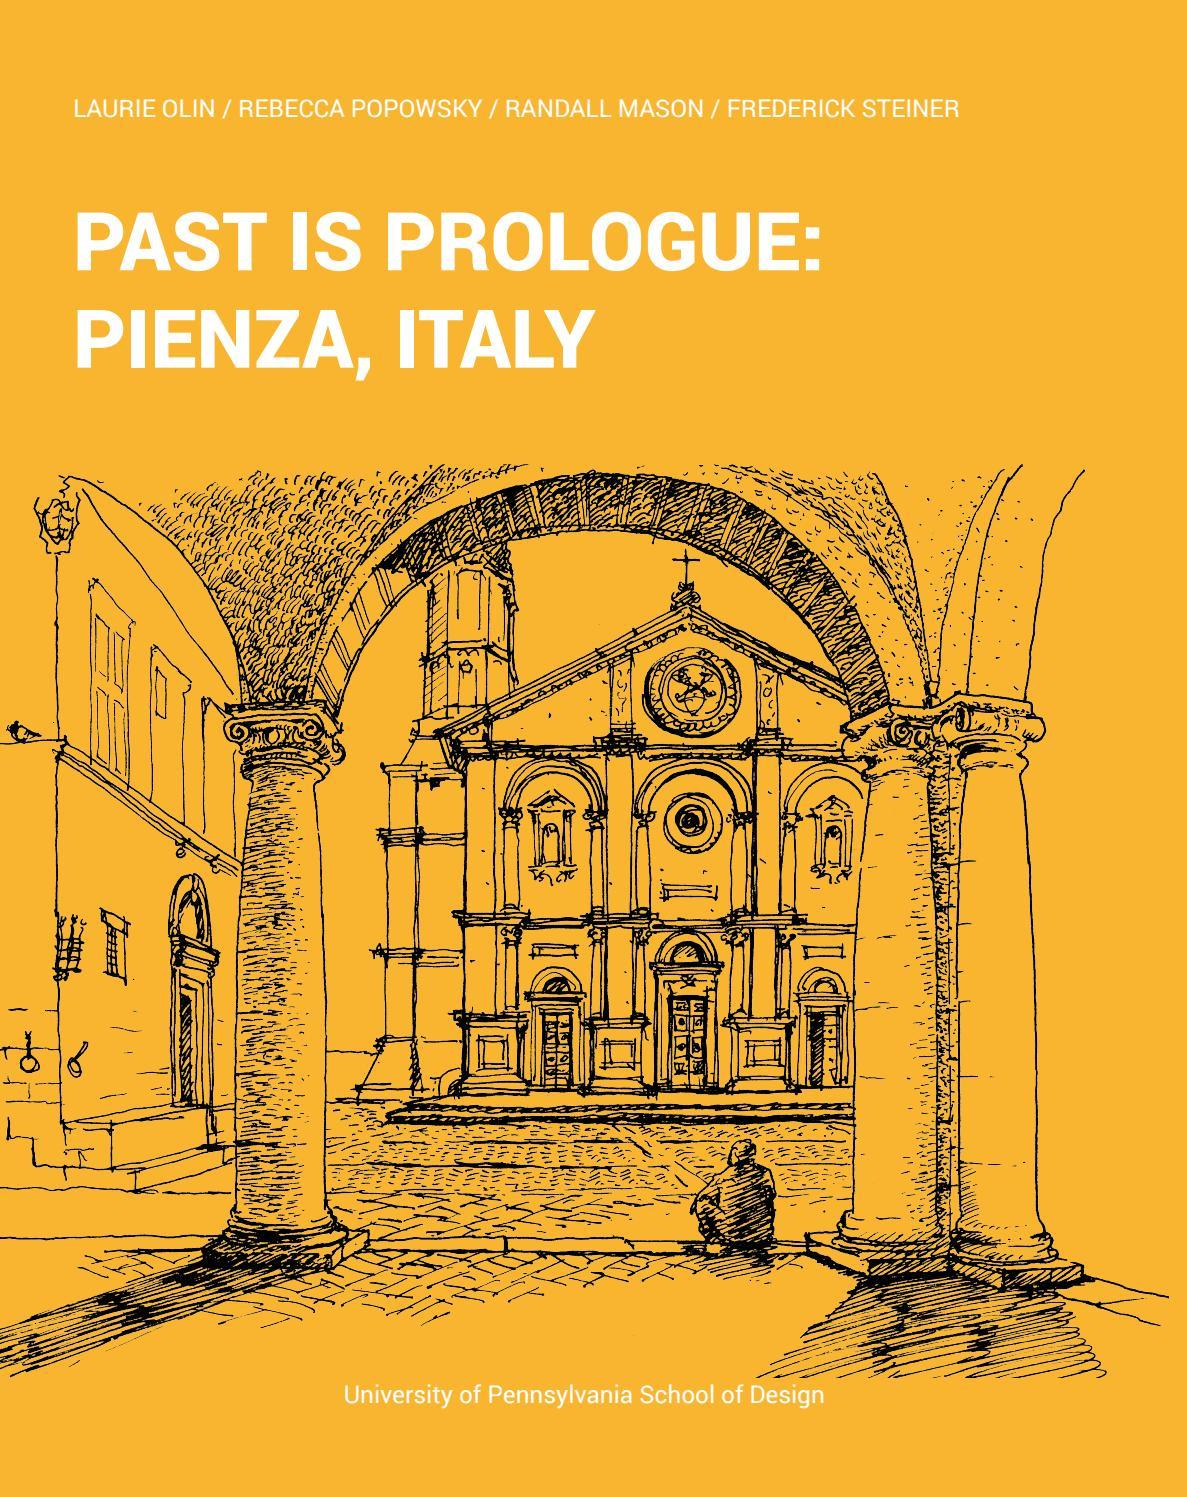 La Mia Città Ideale Test past is prologue: pienza, italy by university of